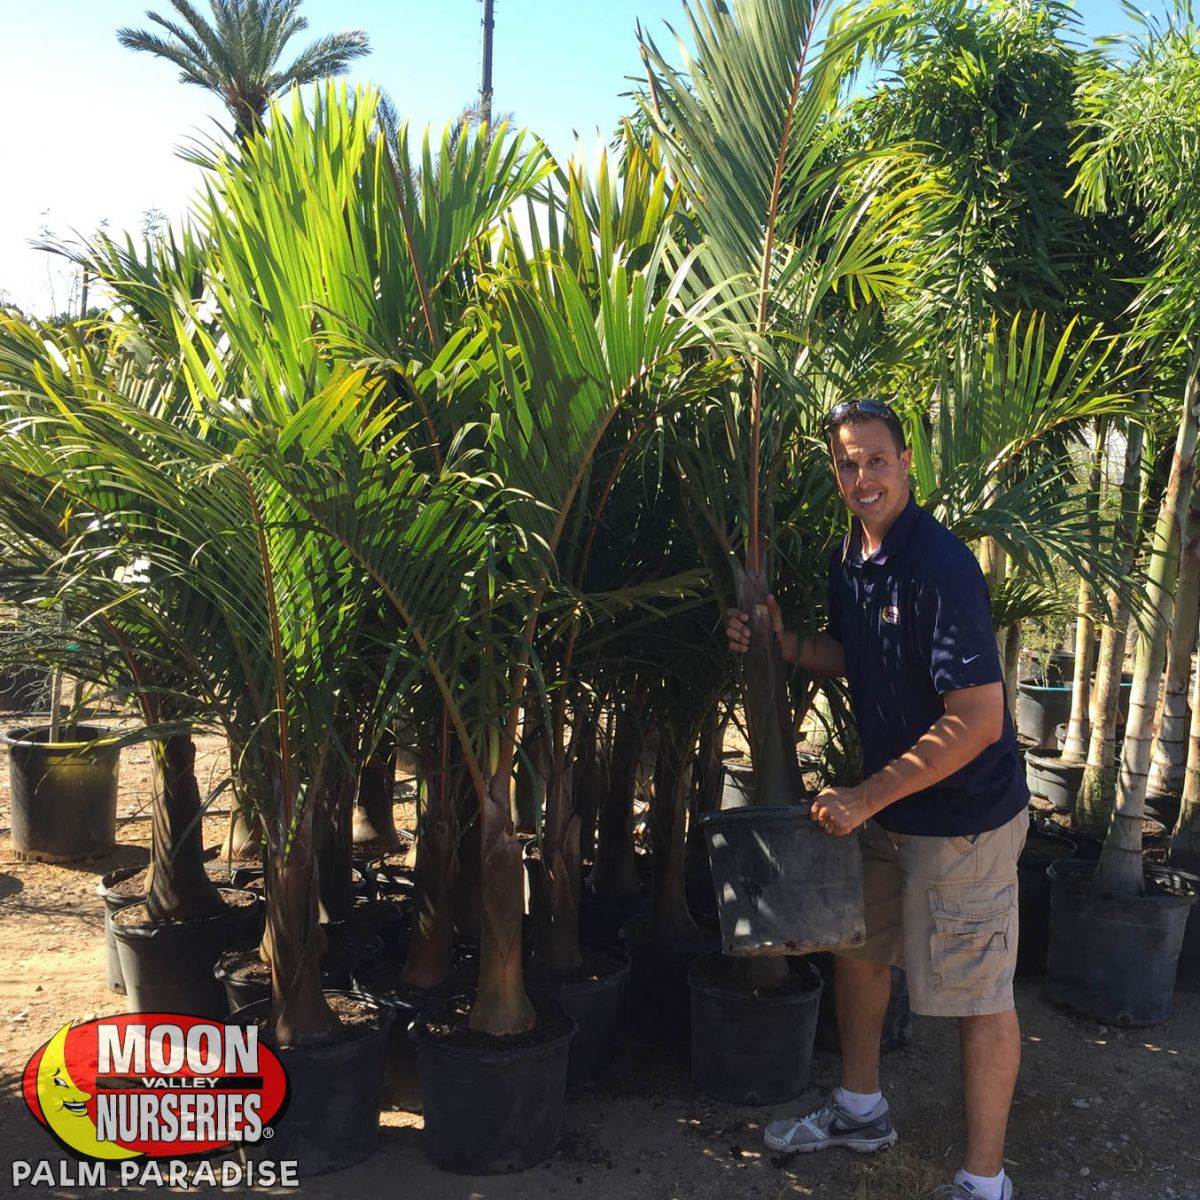 Bottle Palm Palm Tree Palm Paradise Nurseries